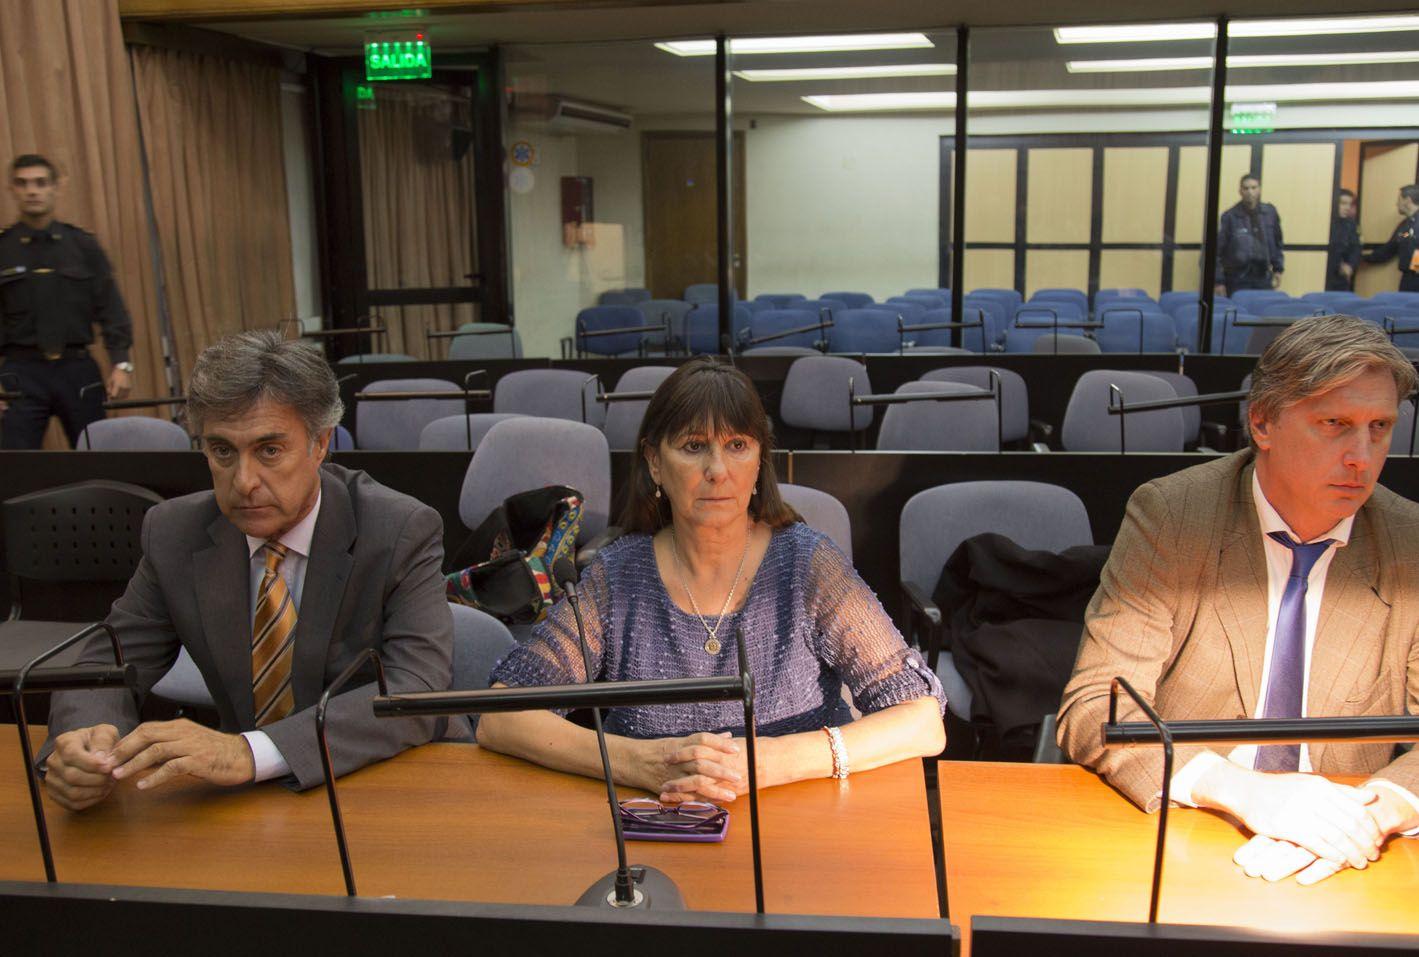 En el banquillo. Felisa Miceli lloró ayer frente a los integrantes del Tribunal Oral Federal Nº 1.